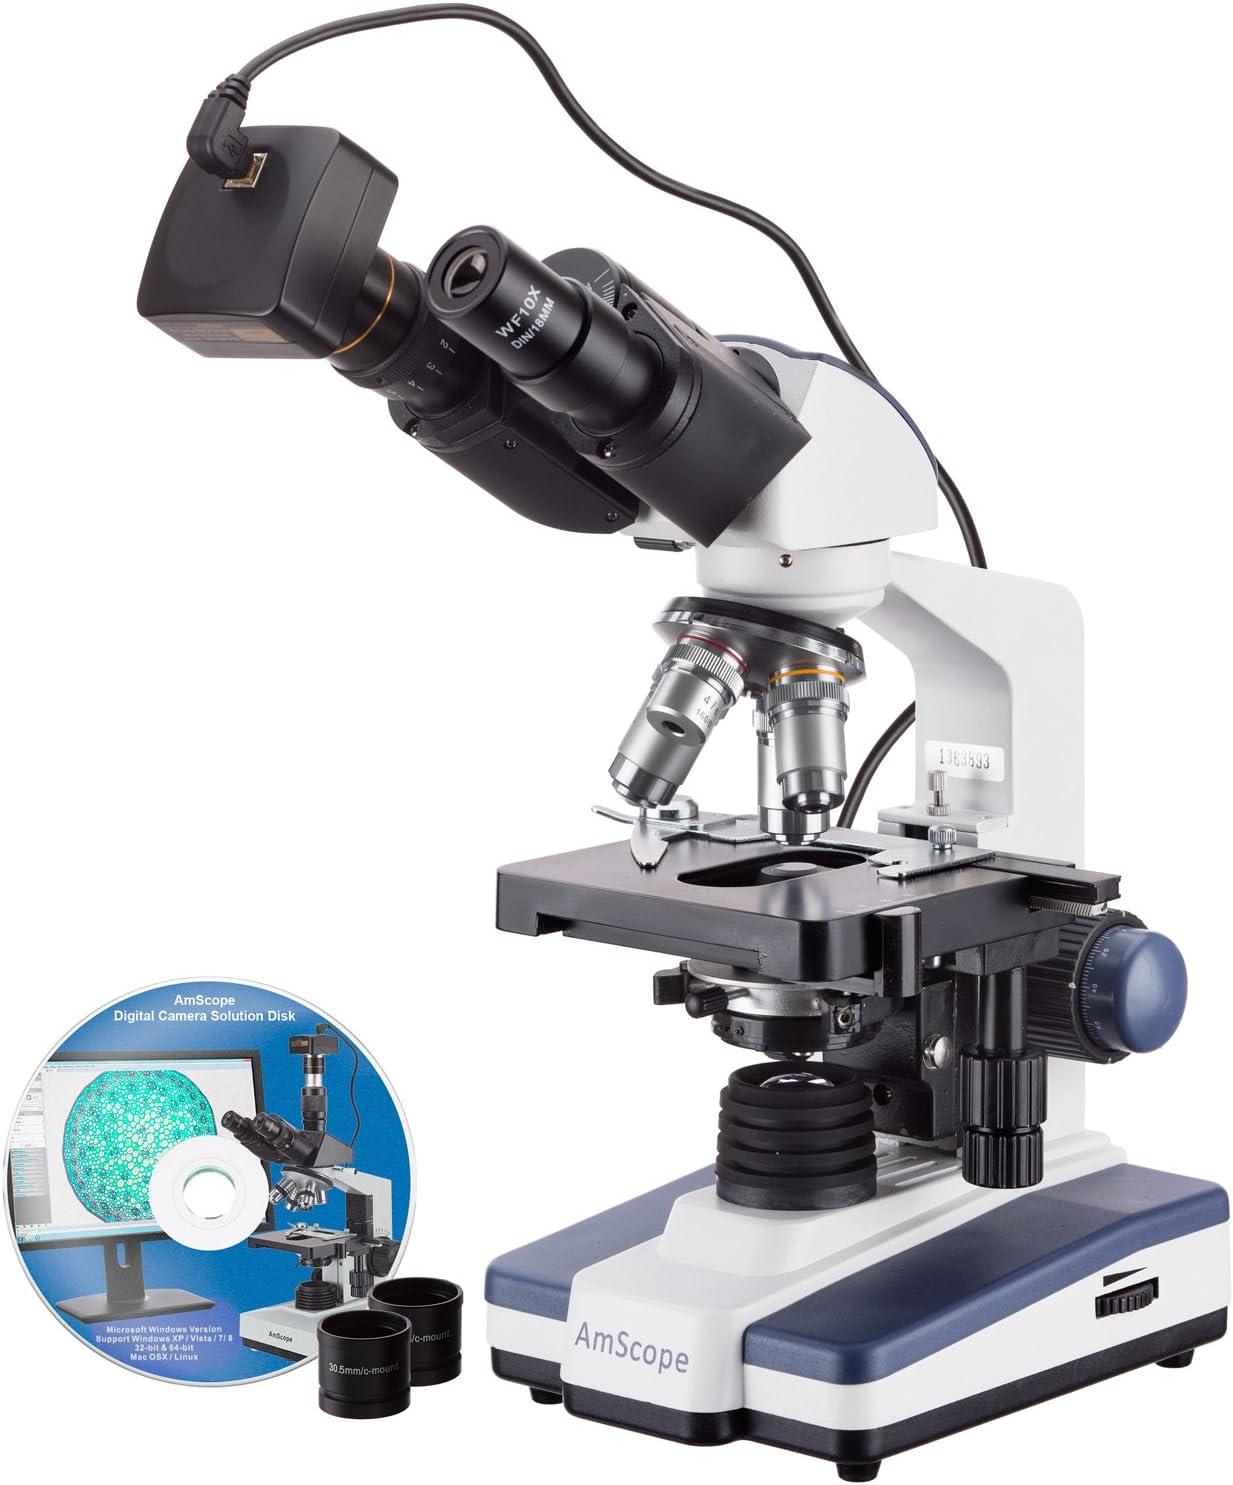 AmScope B120B-3M Digital Ranking TOP6 Siedentopf Compound Microscop Popular brand in the world Binocular